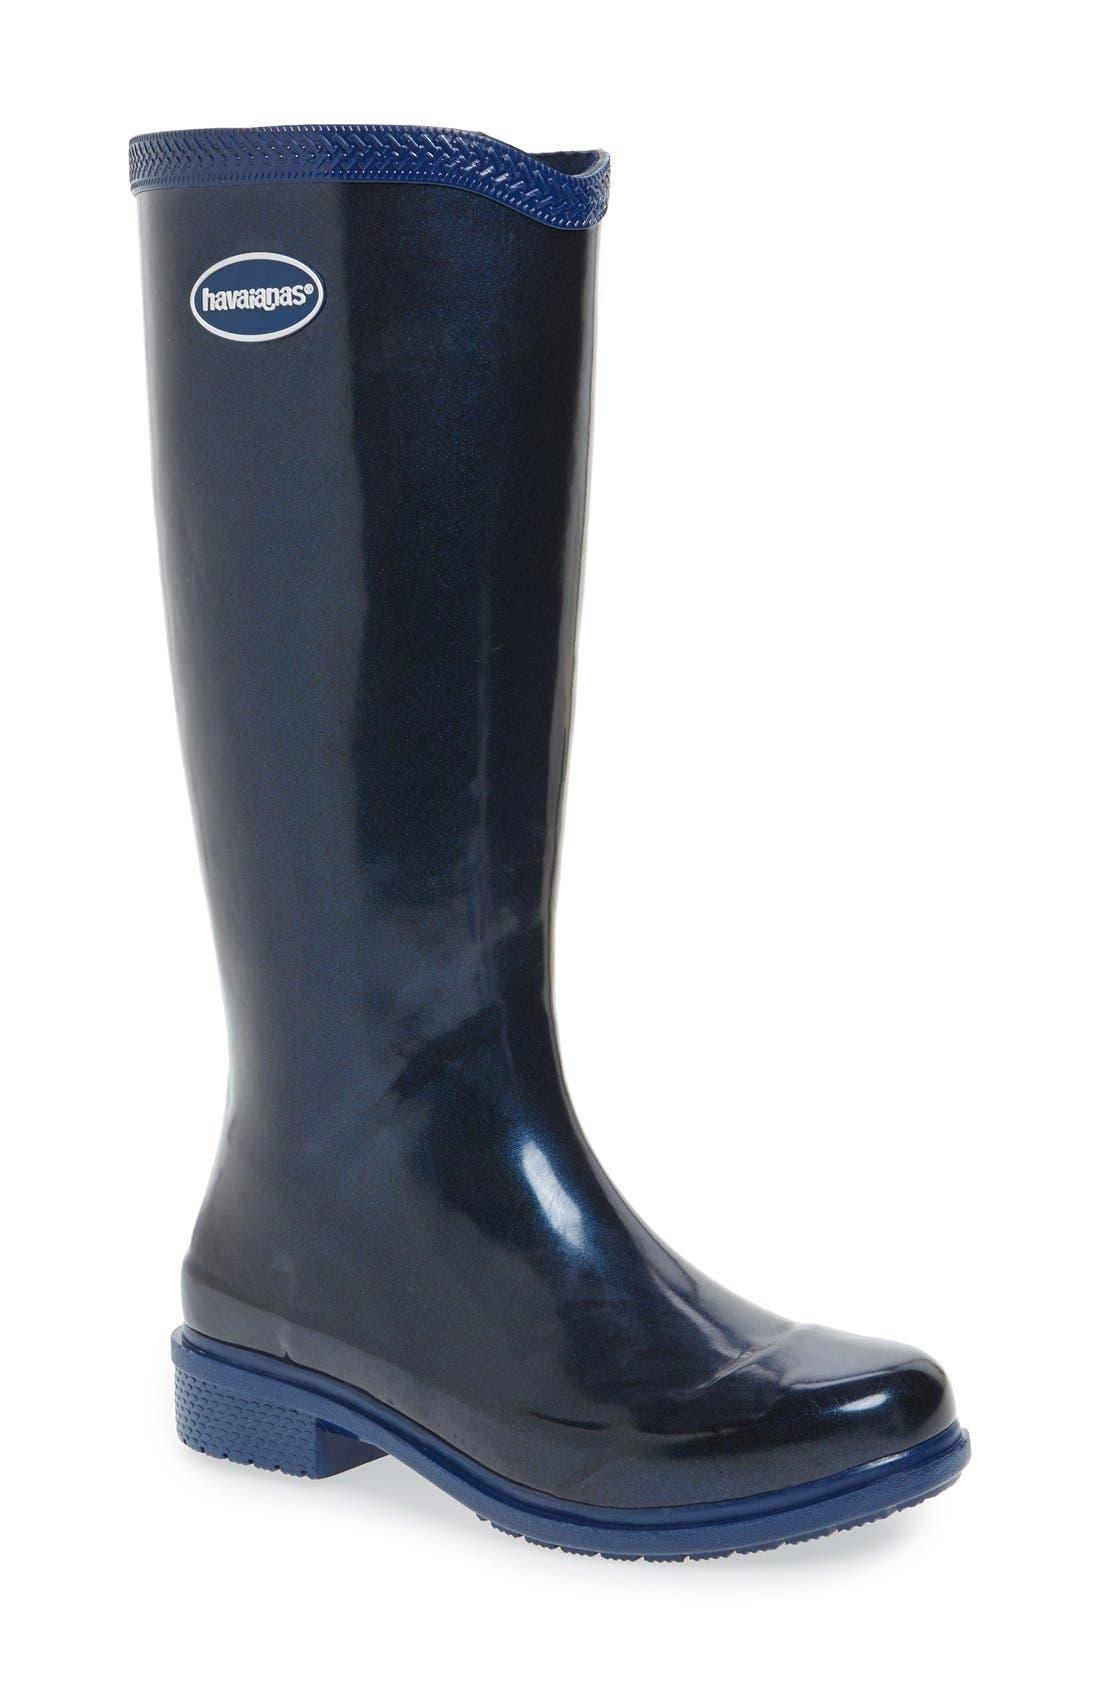 'Galochas Hi Metallic' Waterproof Rain Boot,                         Main,                         color, Navy Blue Metallic